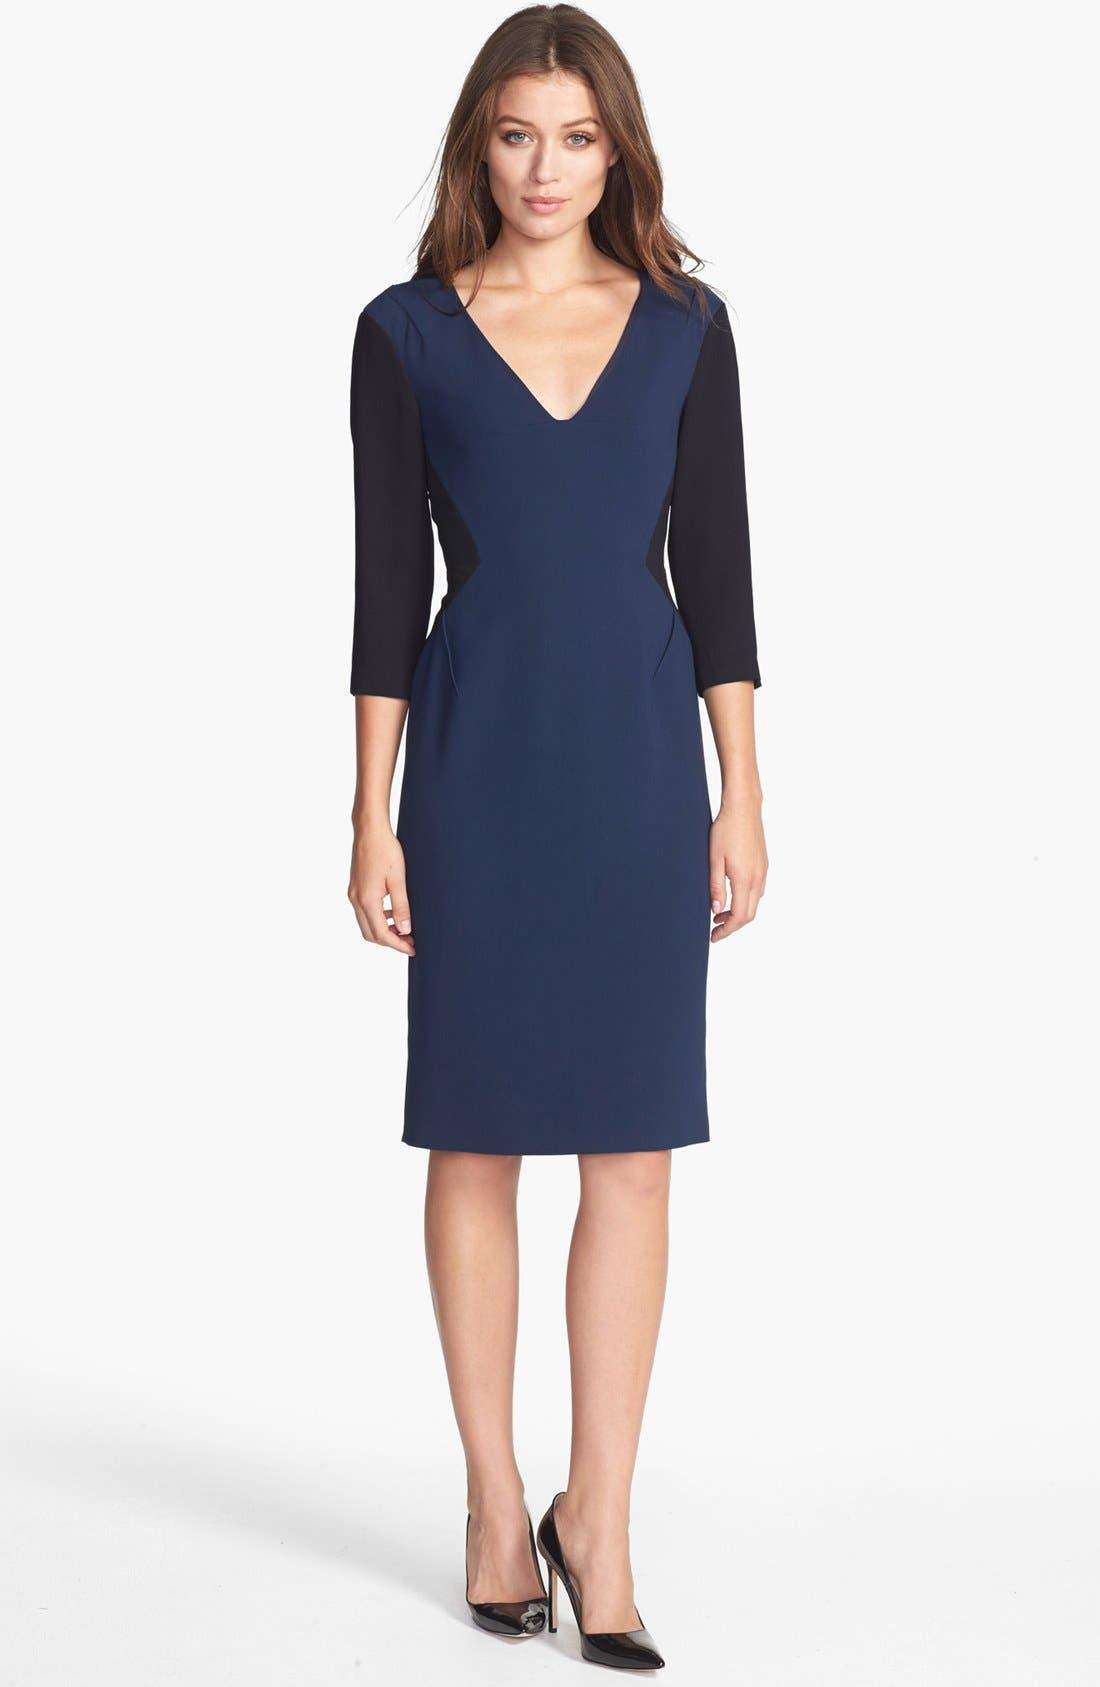 Alternate Image 1 Selected - Rachel Roy Colorblock Crepe Sheath Dress